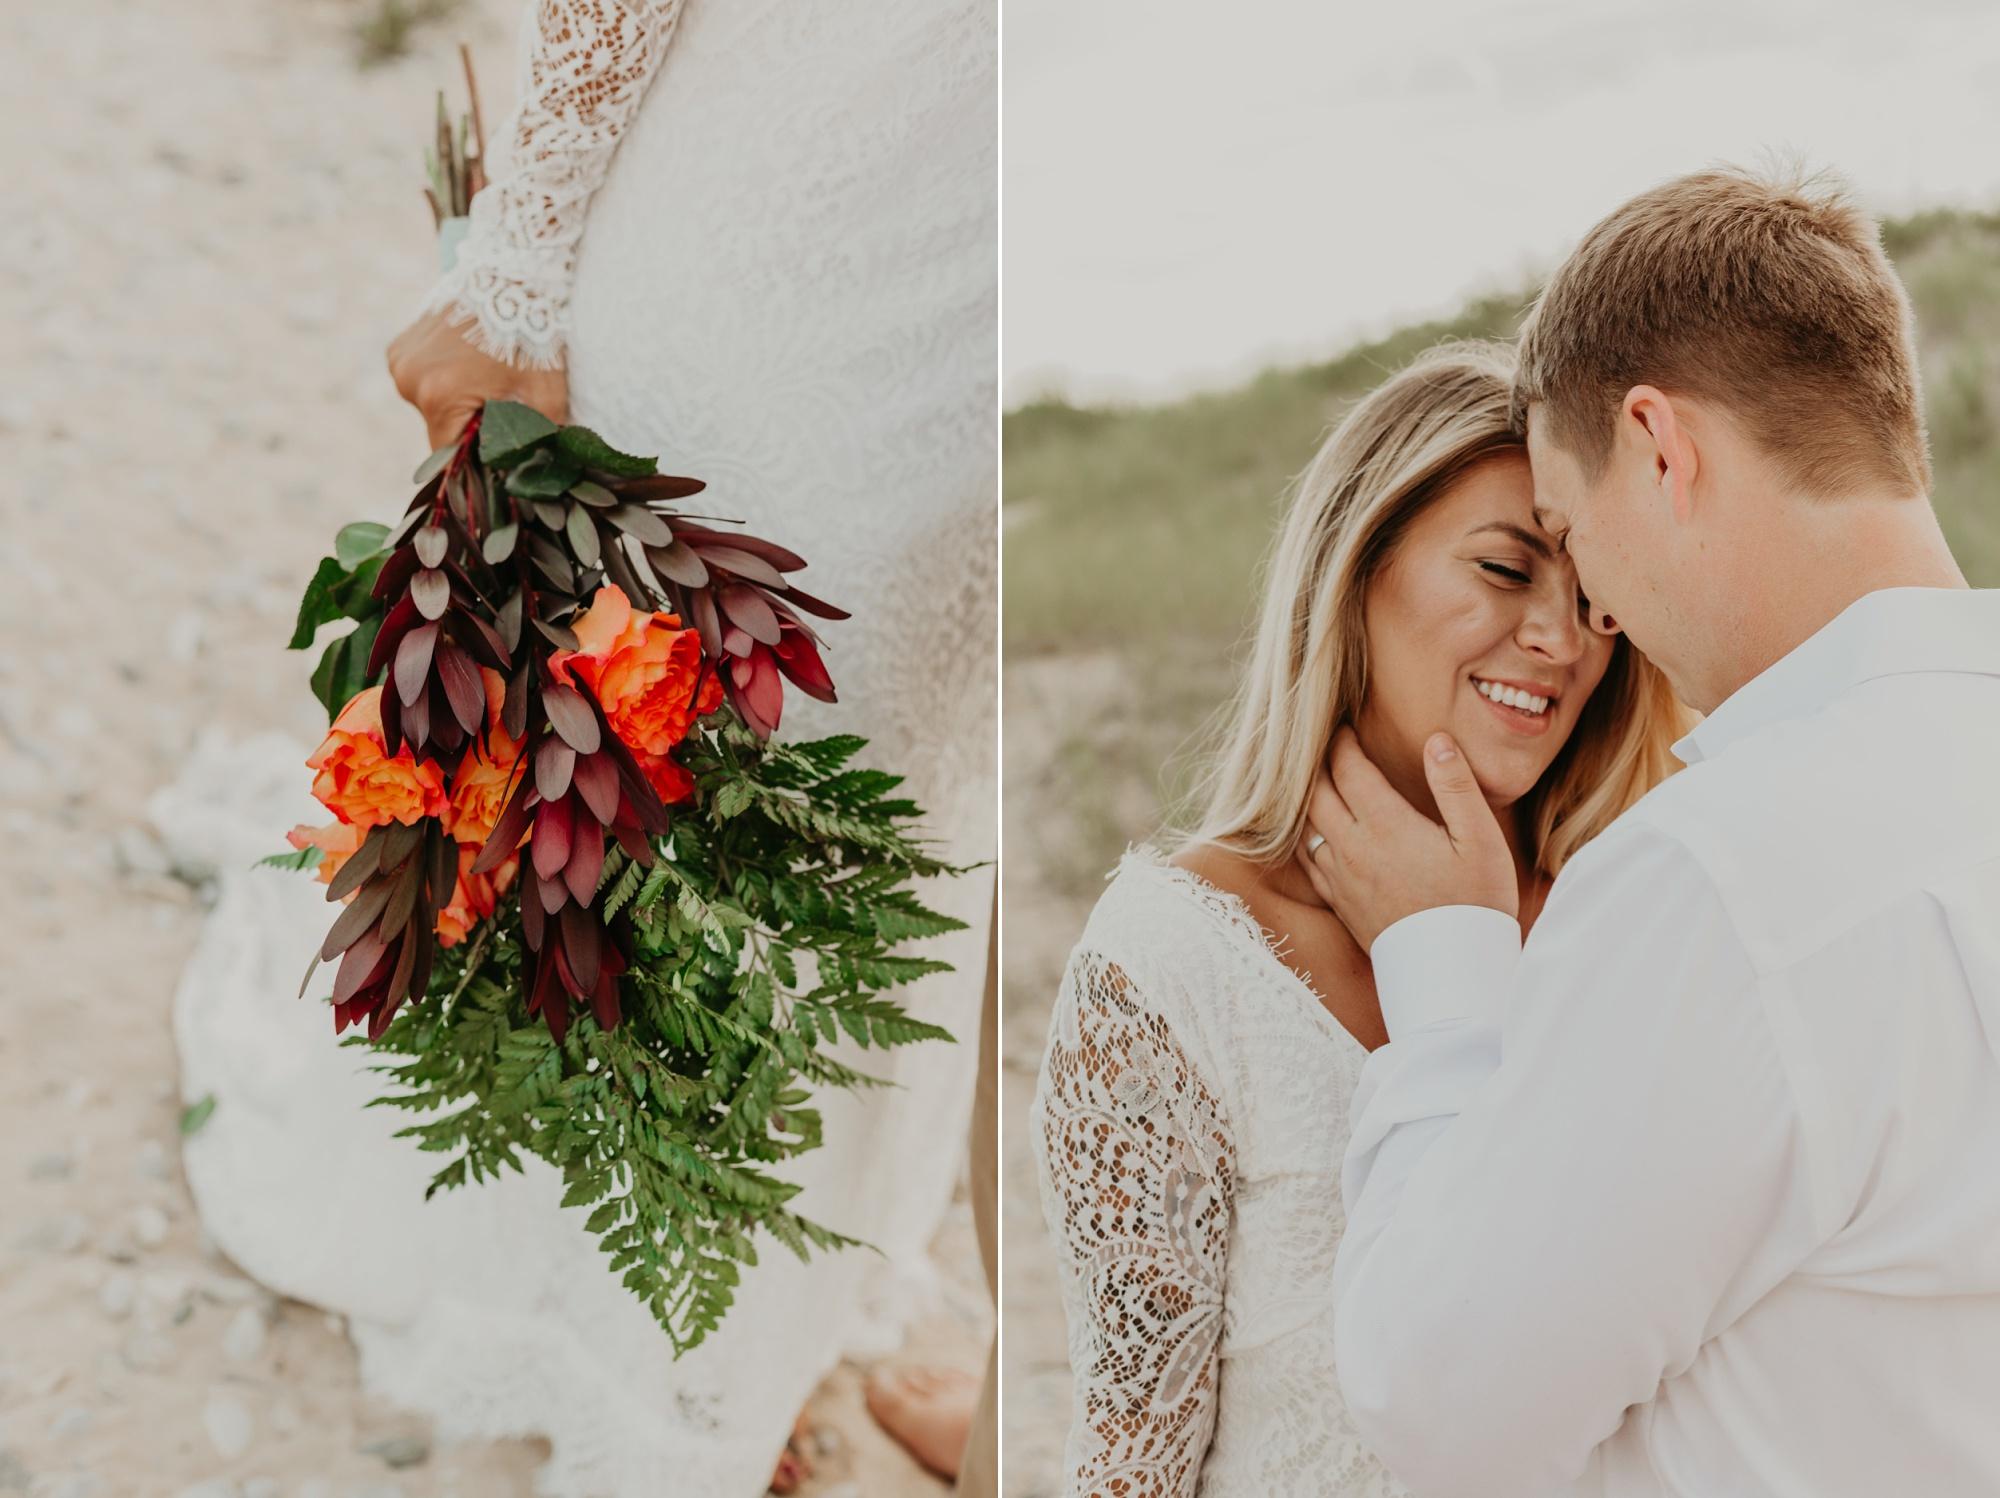 Petoskey elopement photographer. Lake Michigan beach portraits.